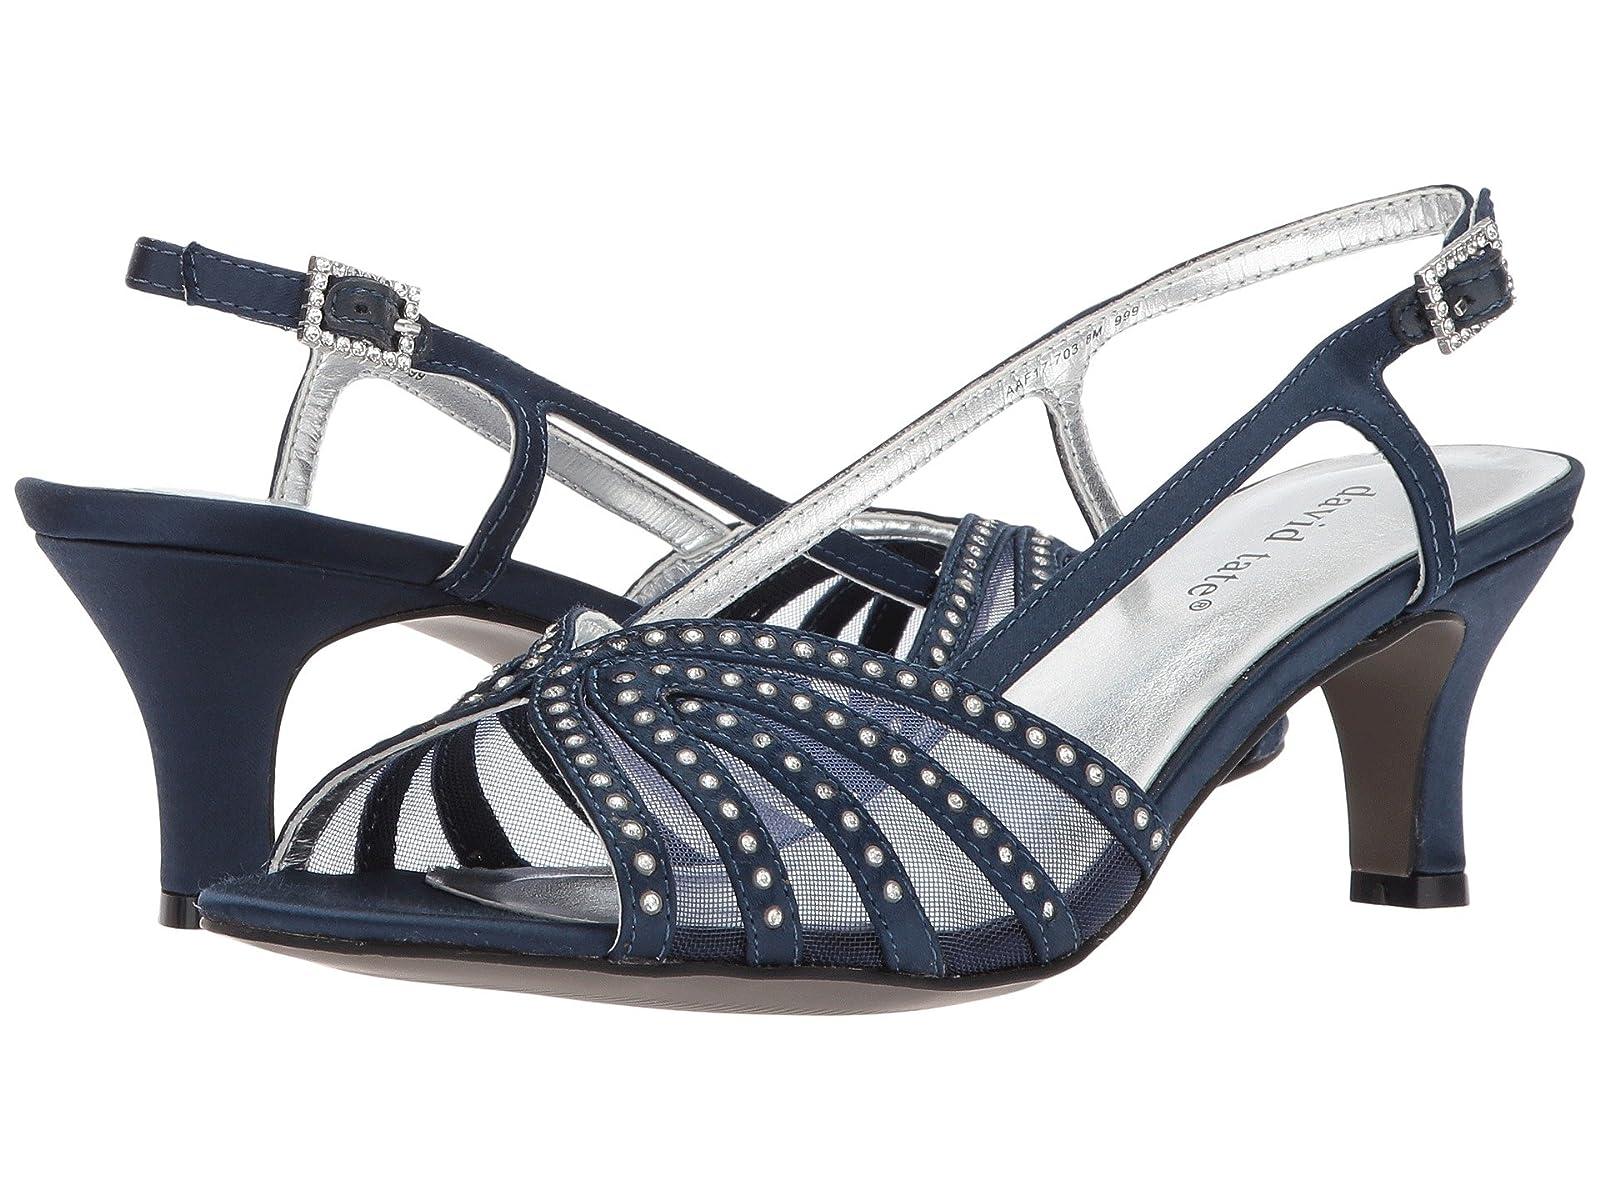 David Tate SizzleCheap and distinctive eye-catching shoes